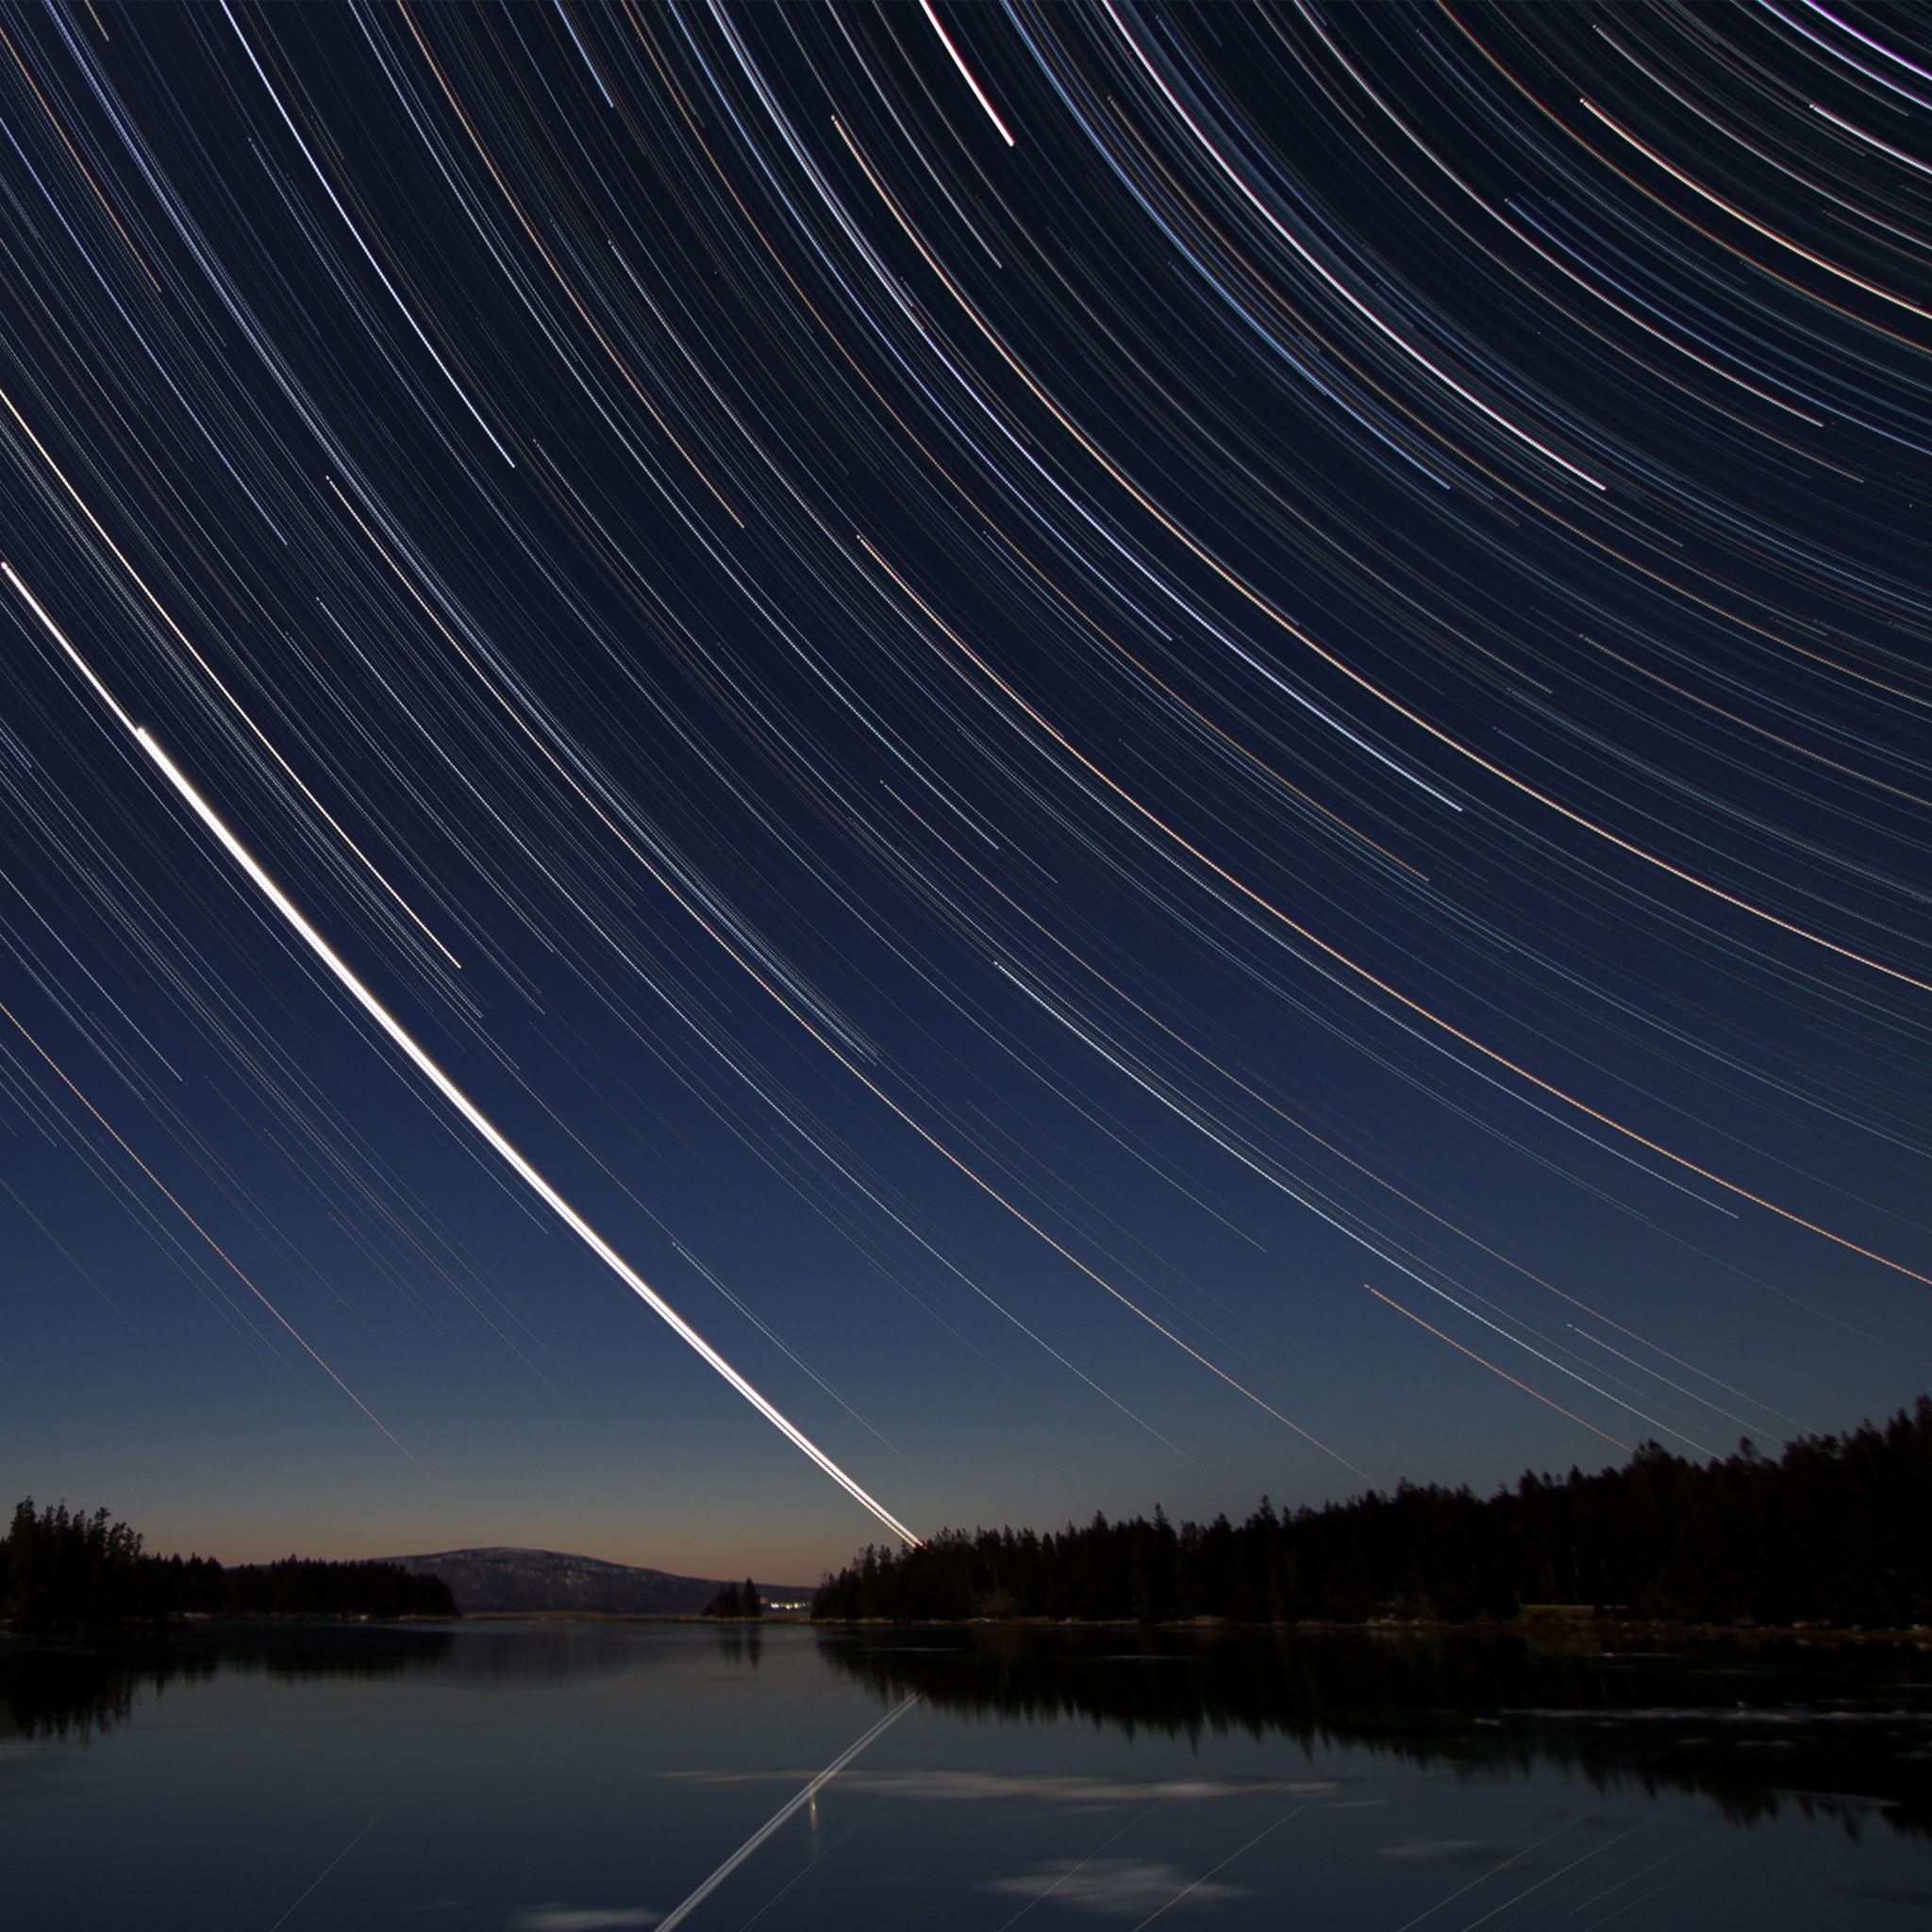 Stars over Acadia iPad Air wallpaper